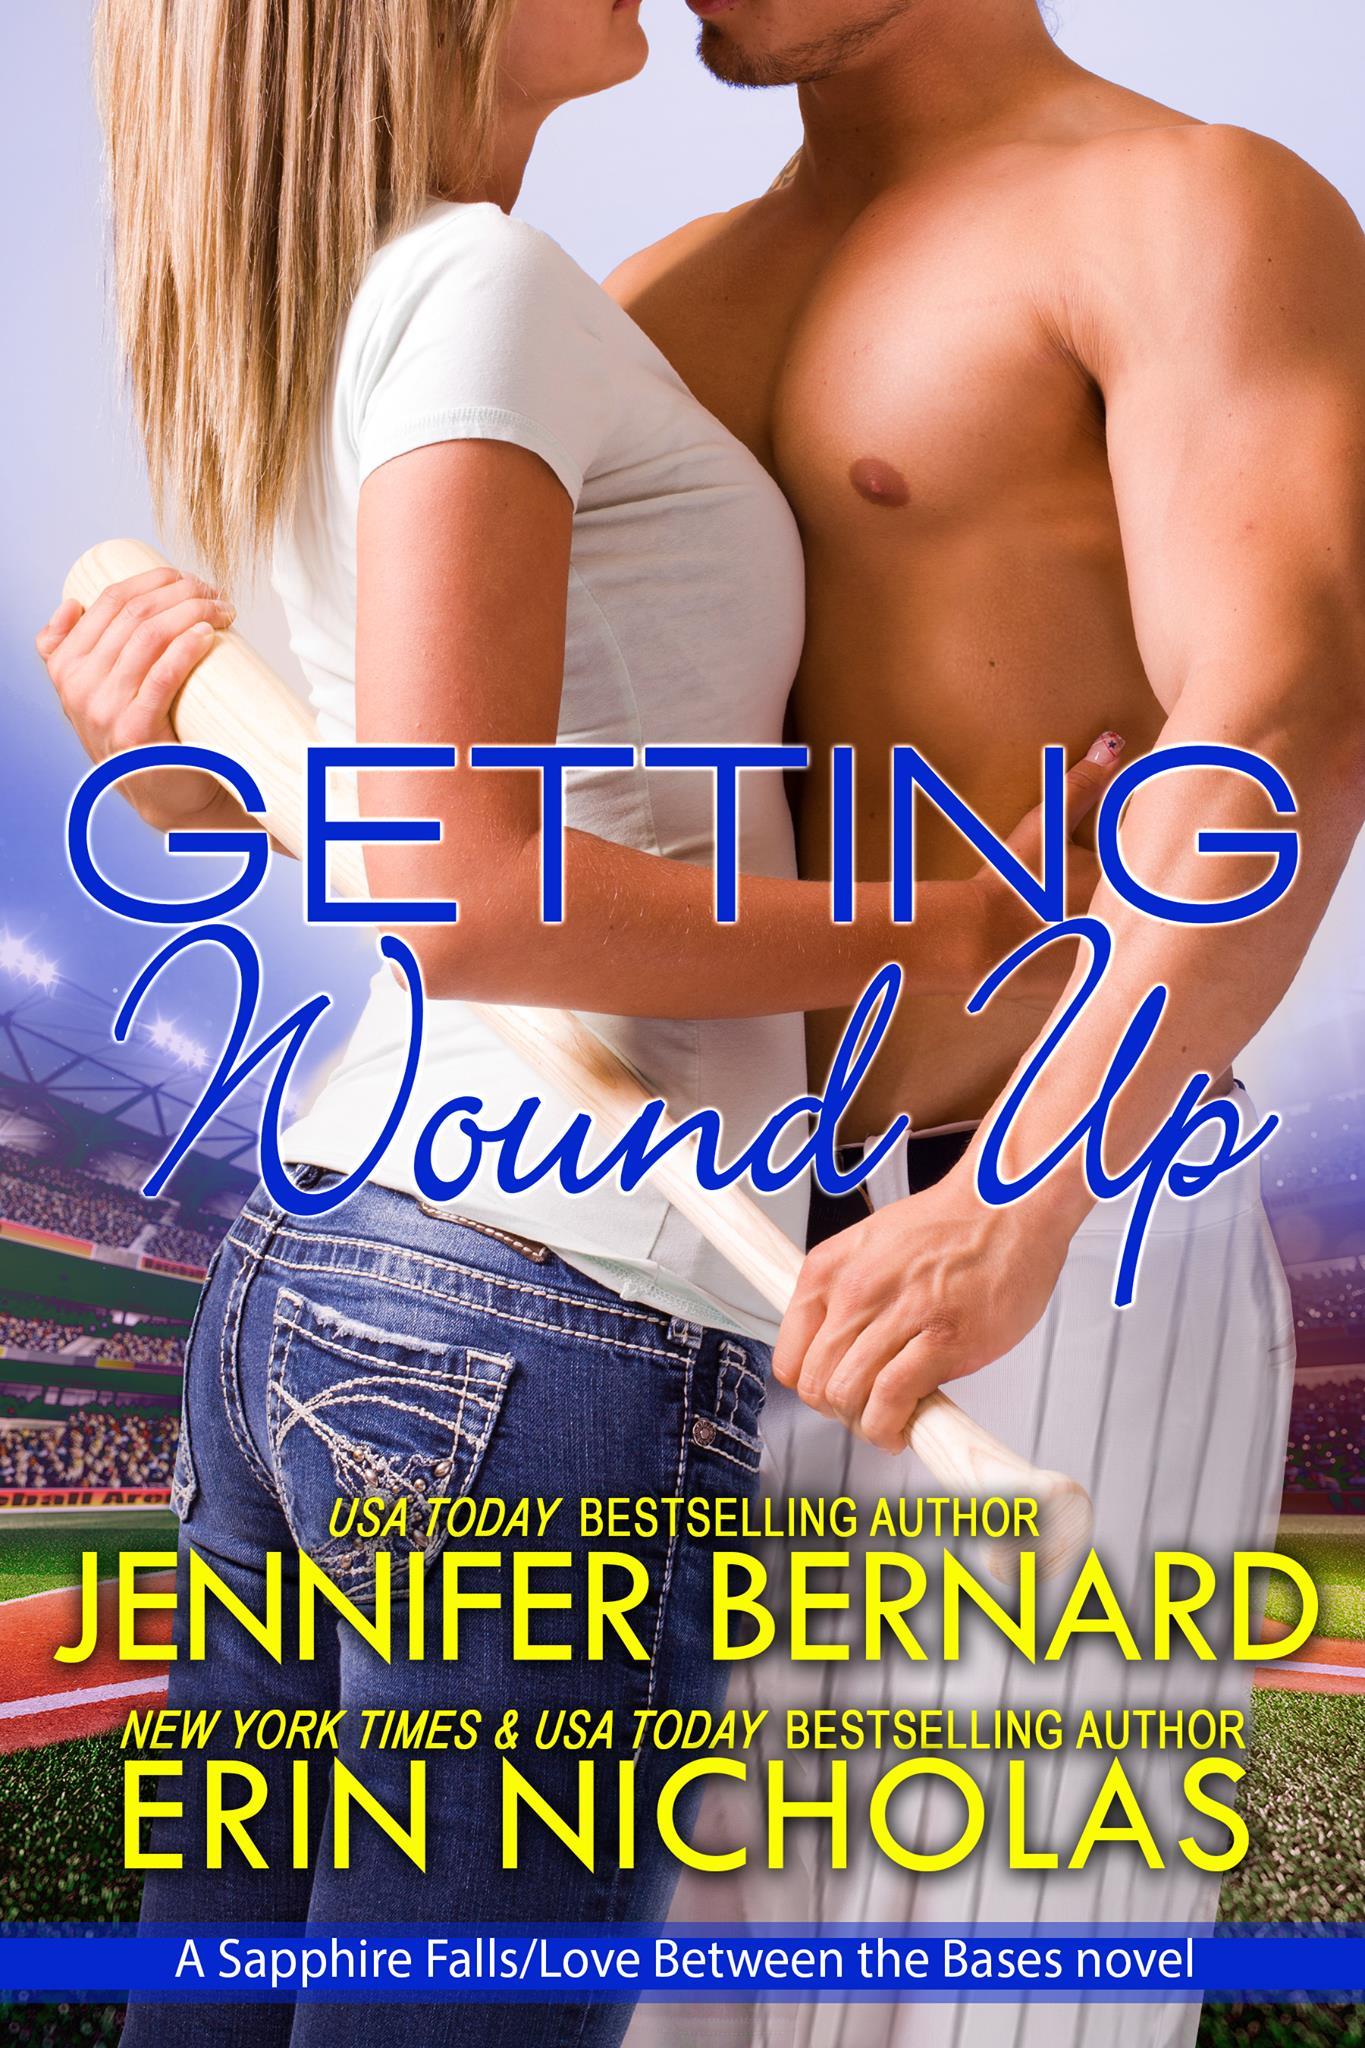 Getting Wound Up by Jennifer Bernard and Erin Nicholas